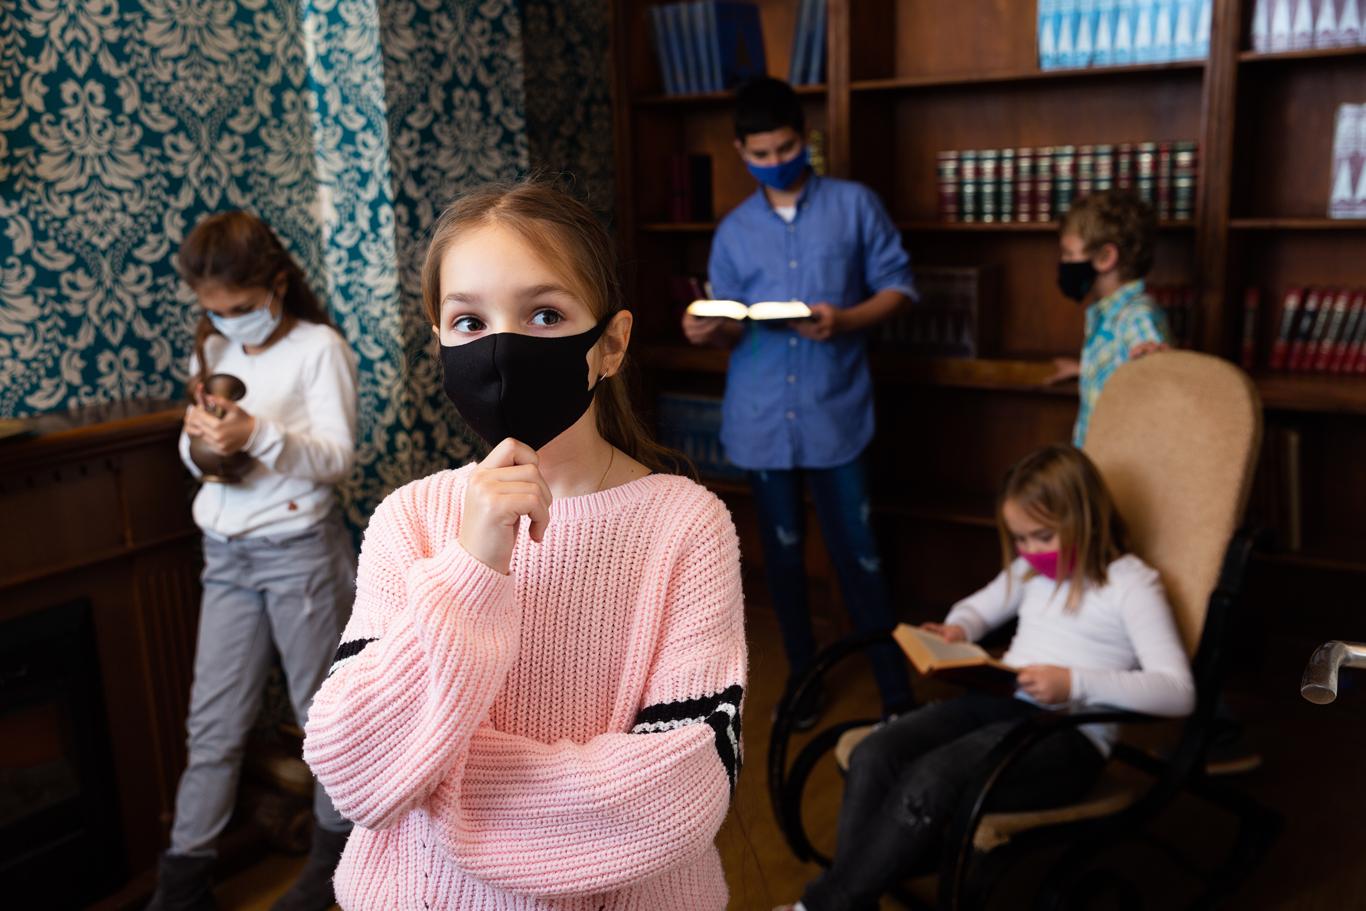 Kids-solving-escape-room-1366-0521